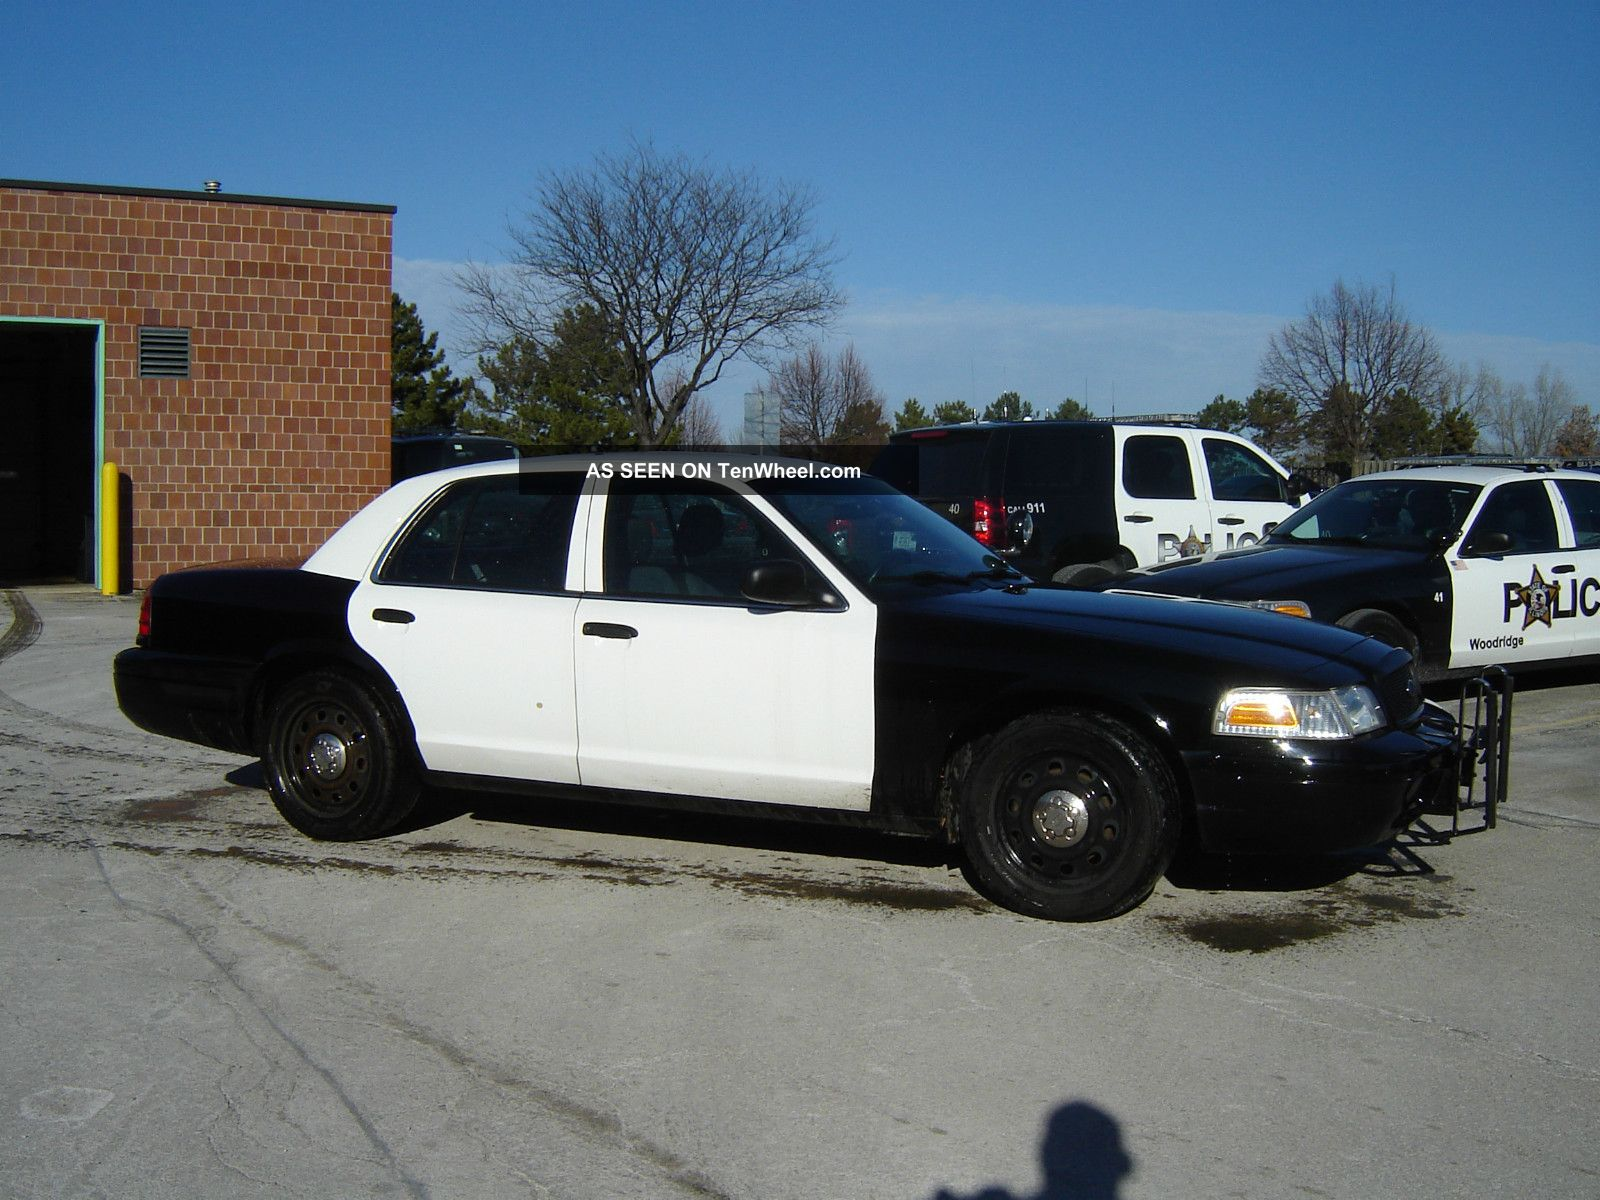 2010 Ford Crown Victoria Police Interceptor Sedan Crown Victoria photo